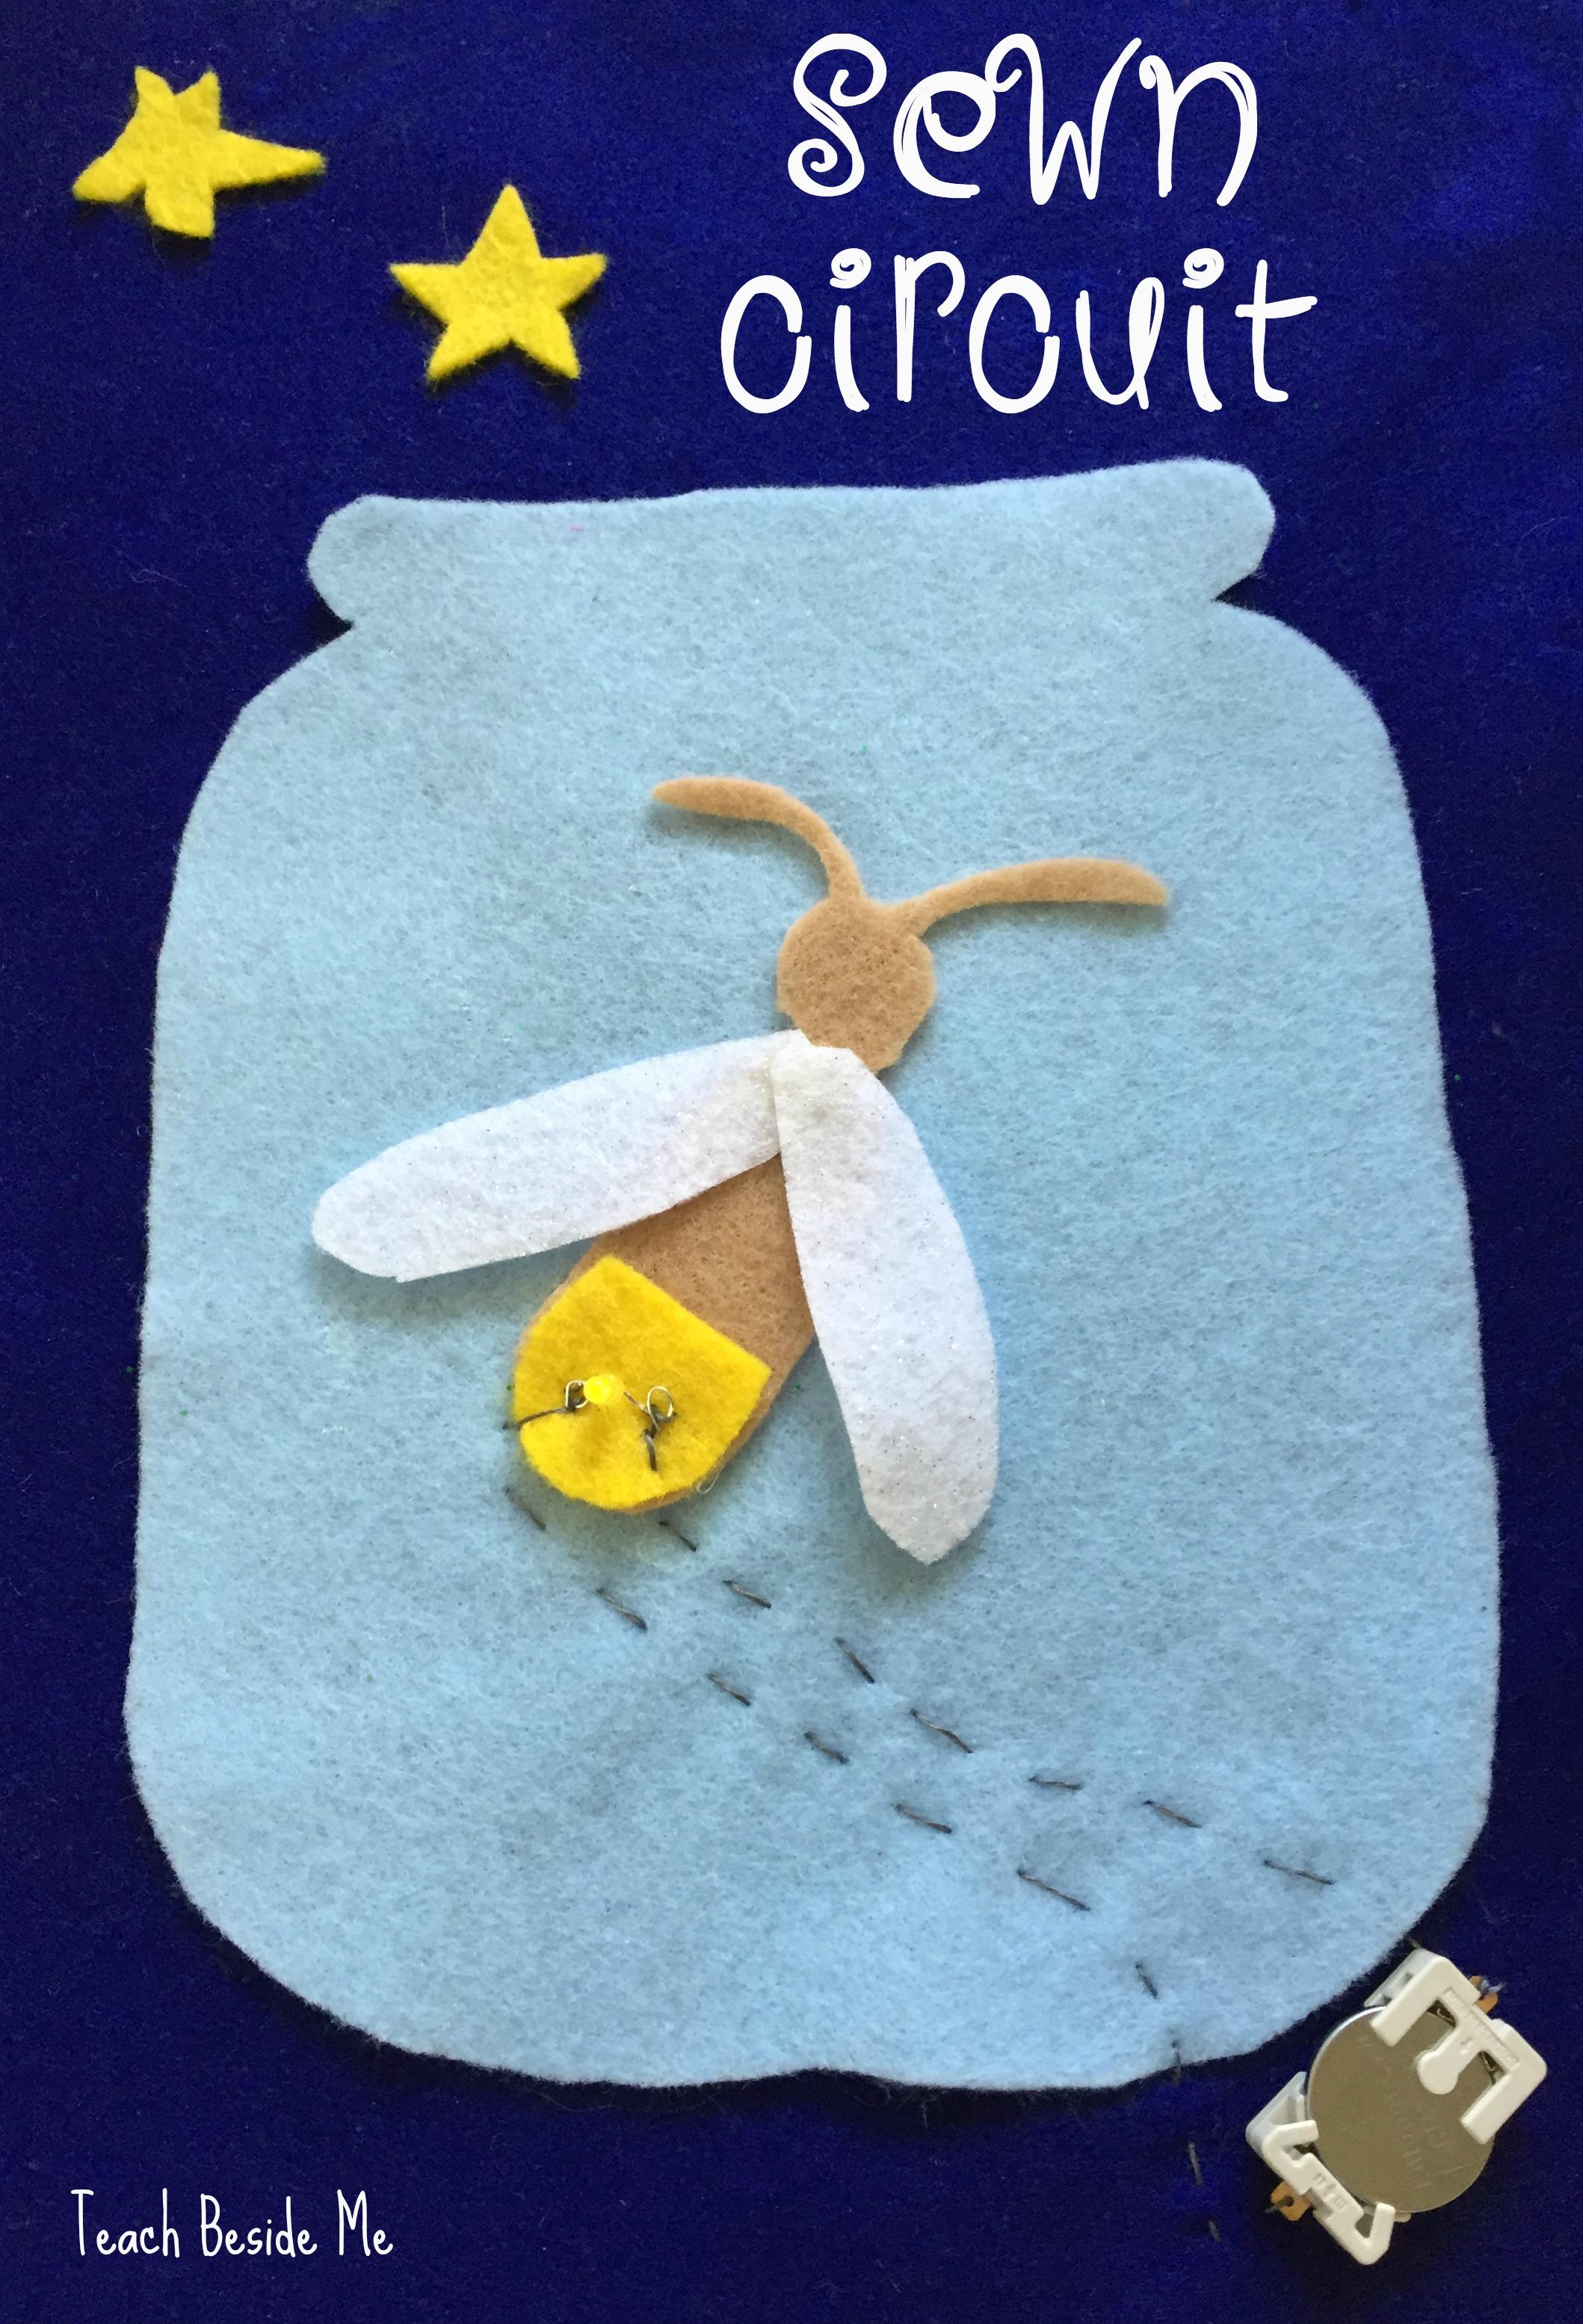 Firefly Craft: Sewn Circuits